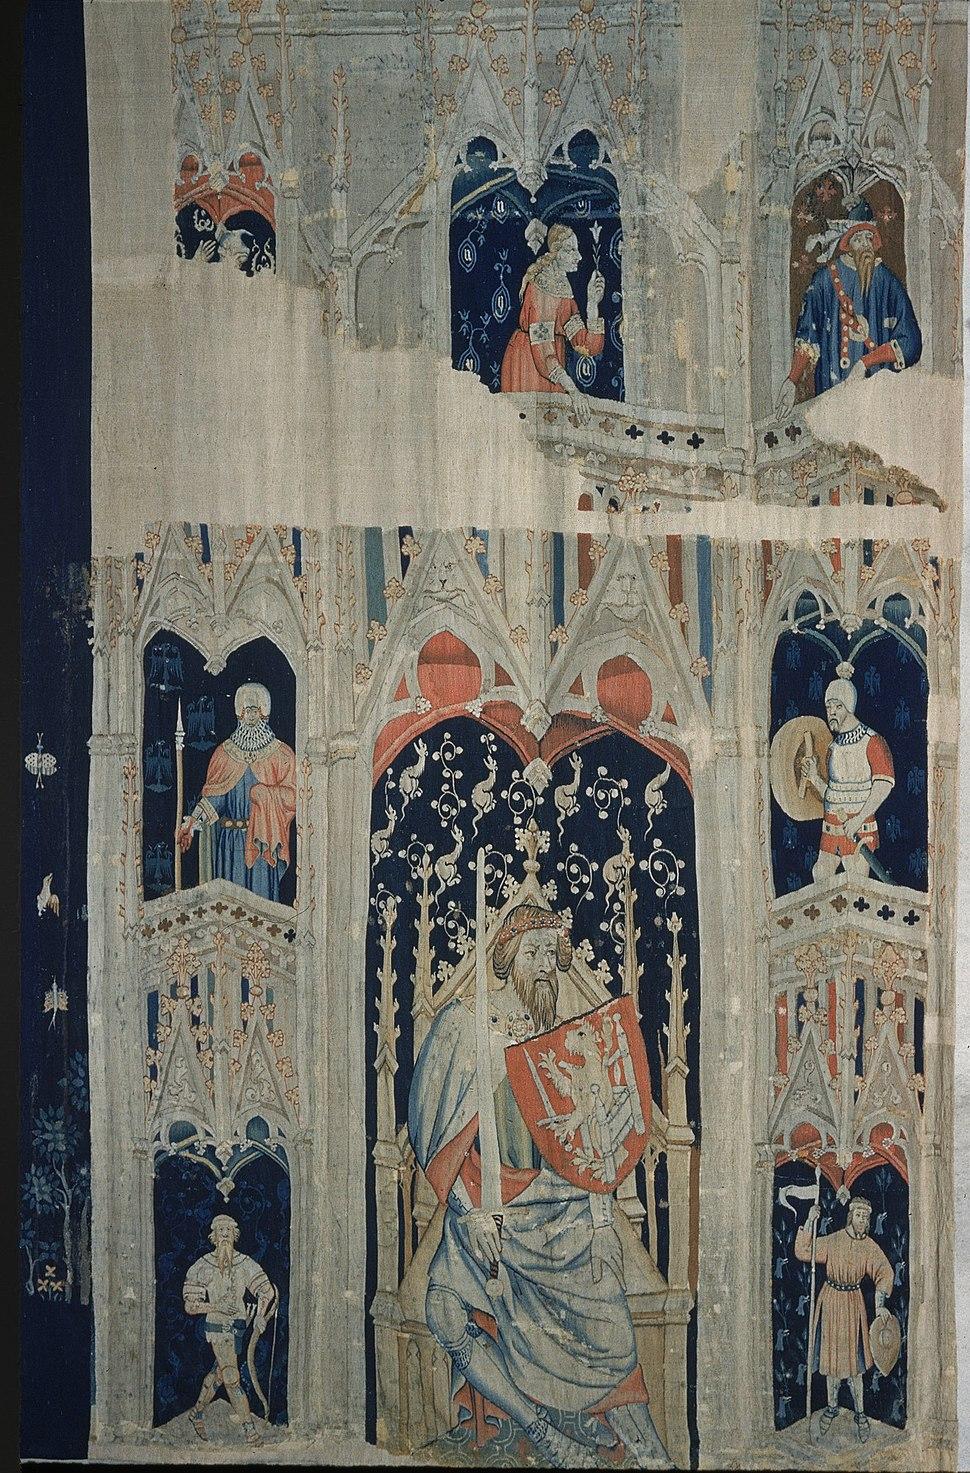 Alexander the Great or Hector of Troy (from the Nine Heroes Tapestries) MET ra47.101.2d.R